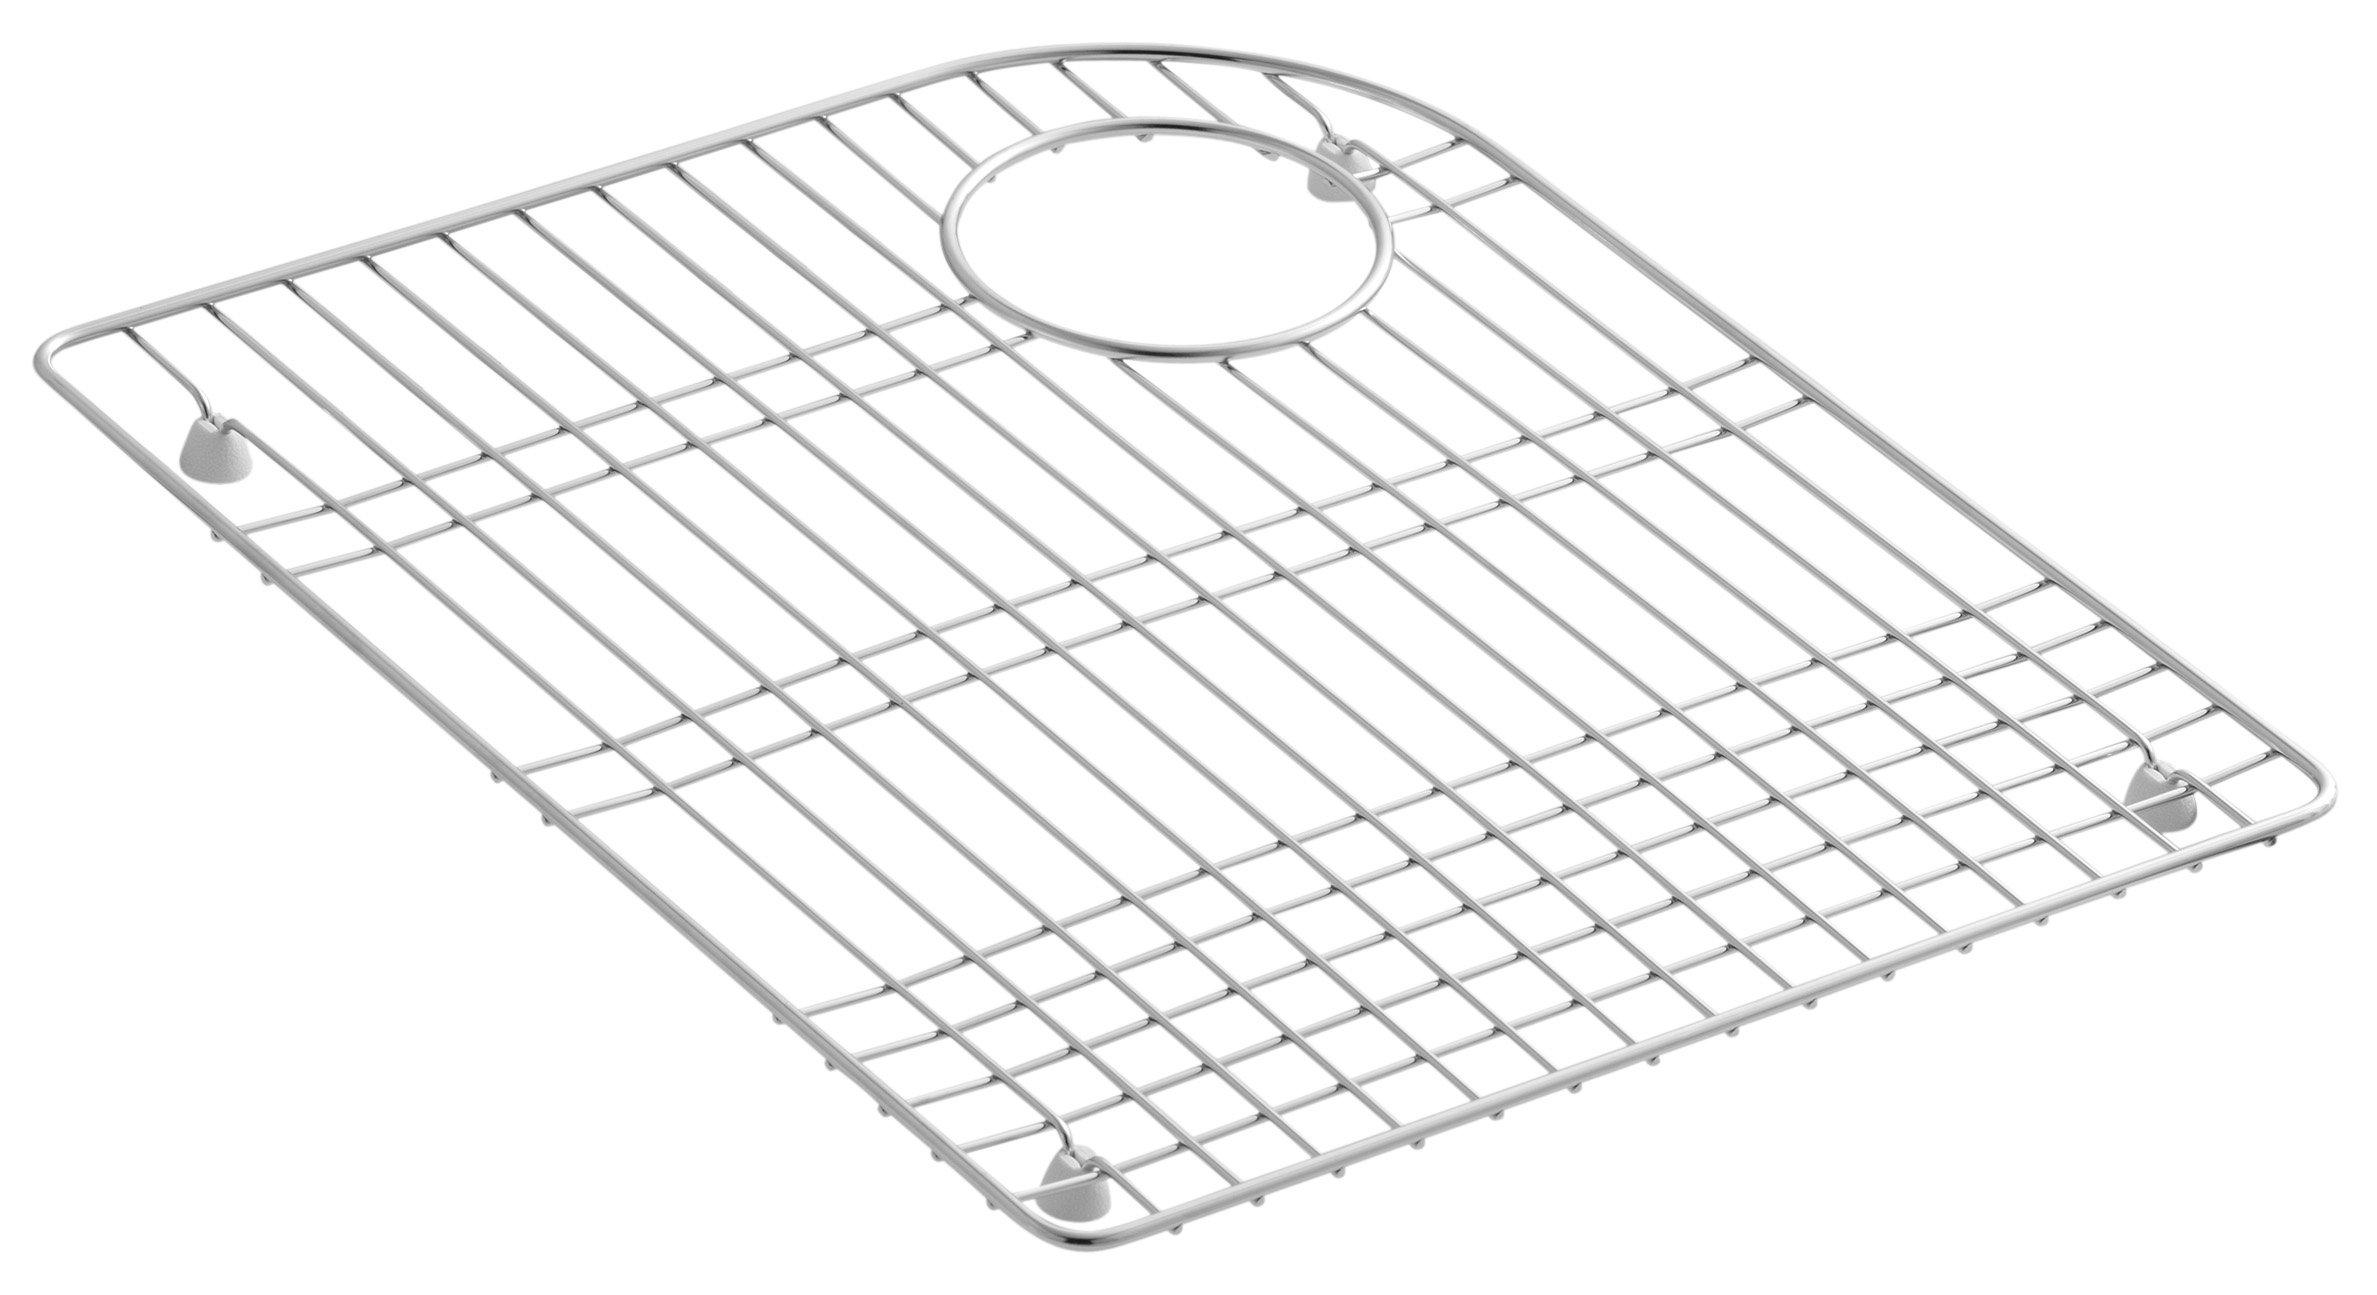 KOHLER K-6001-ST 14.7 Inches by 18 Inches Bottom Basin Rack, Stainless Steel